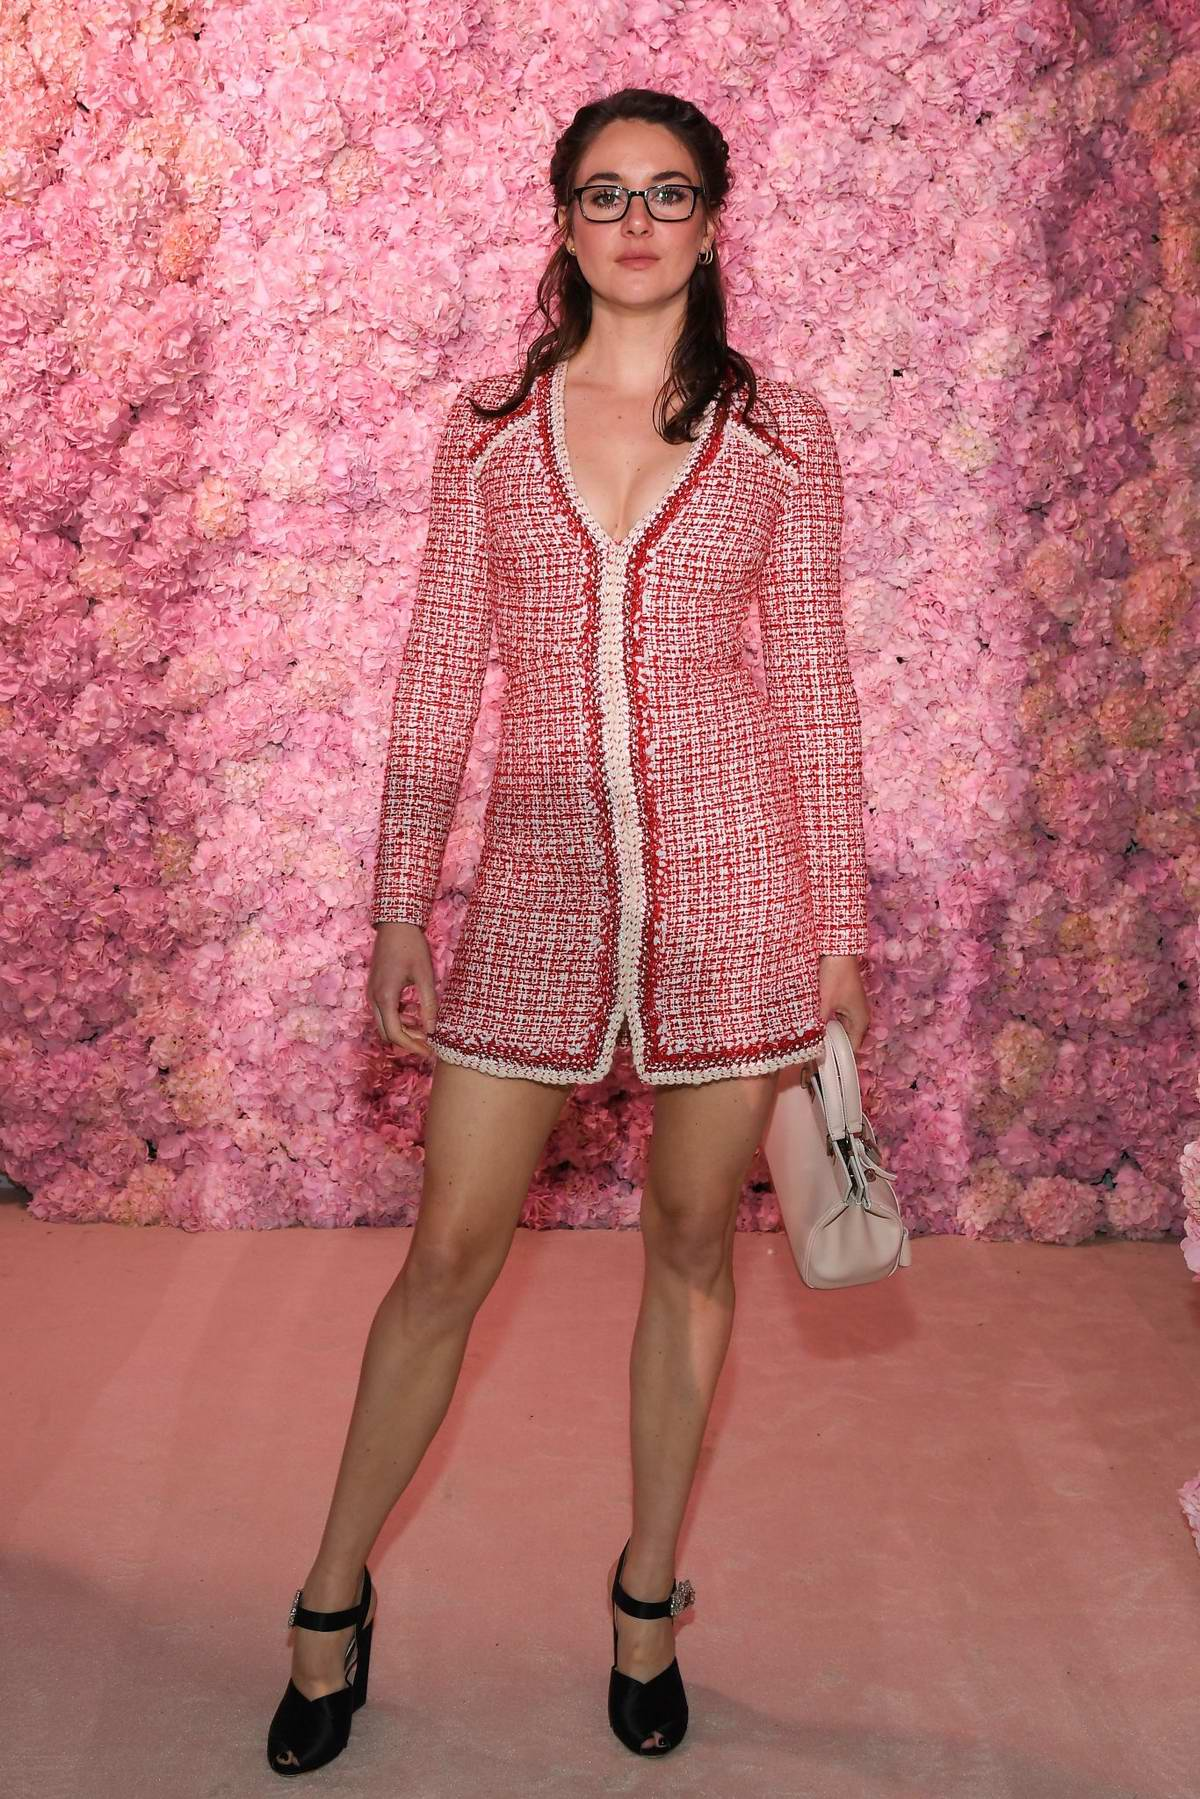 Shailene Woodley attends the Giambattista Valli show, F/W 2020 during Paris Fashion Week in Paris, France